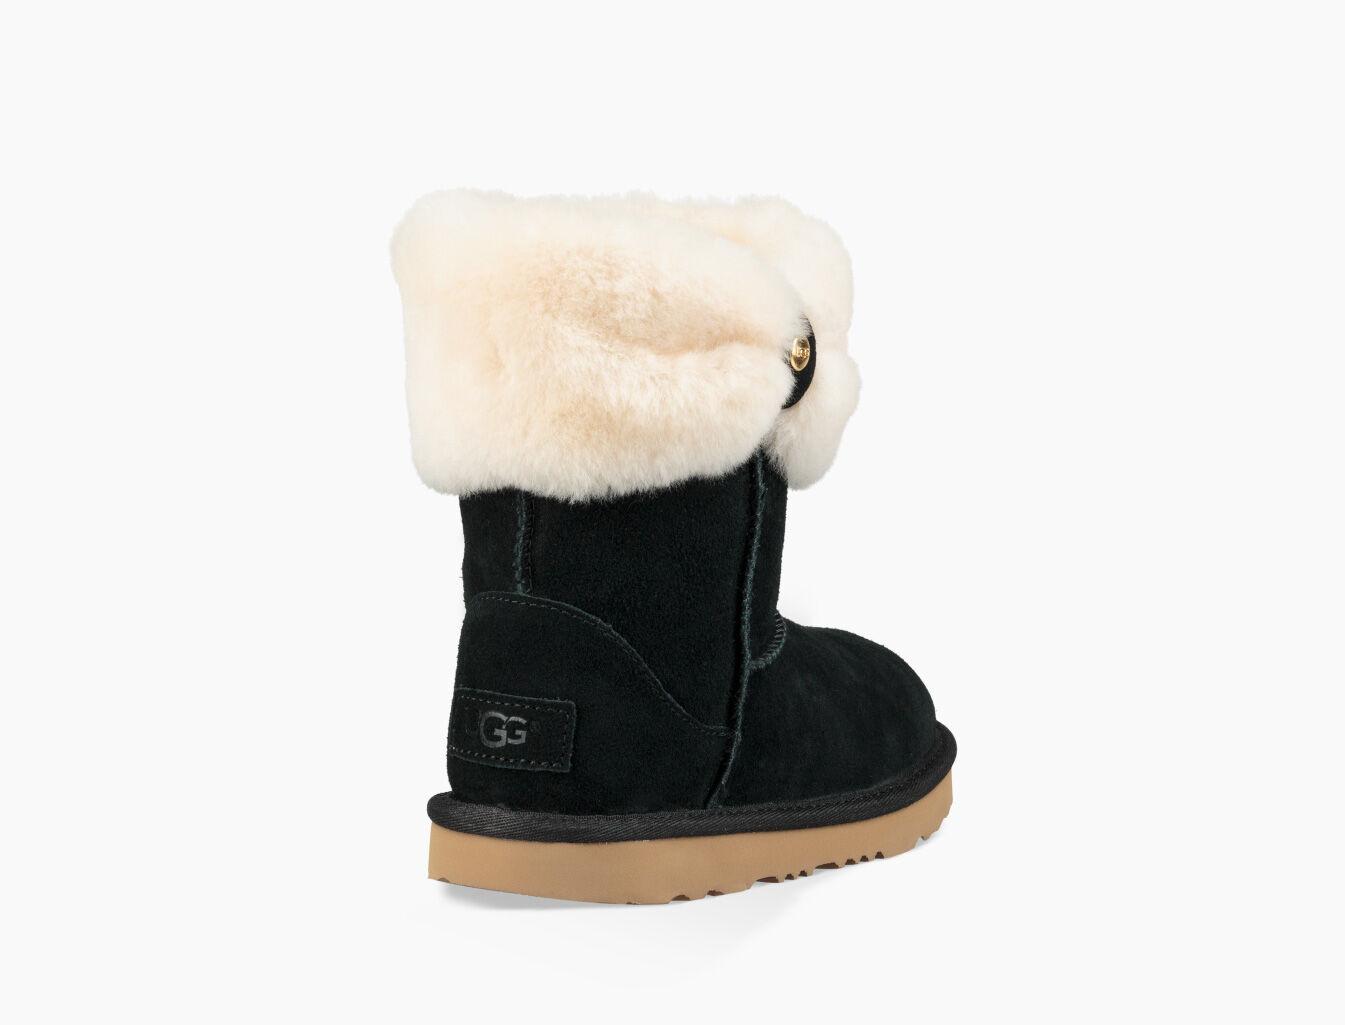 ugg boots Classic short II natur